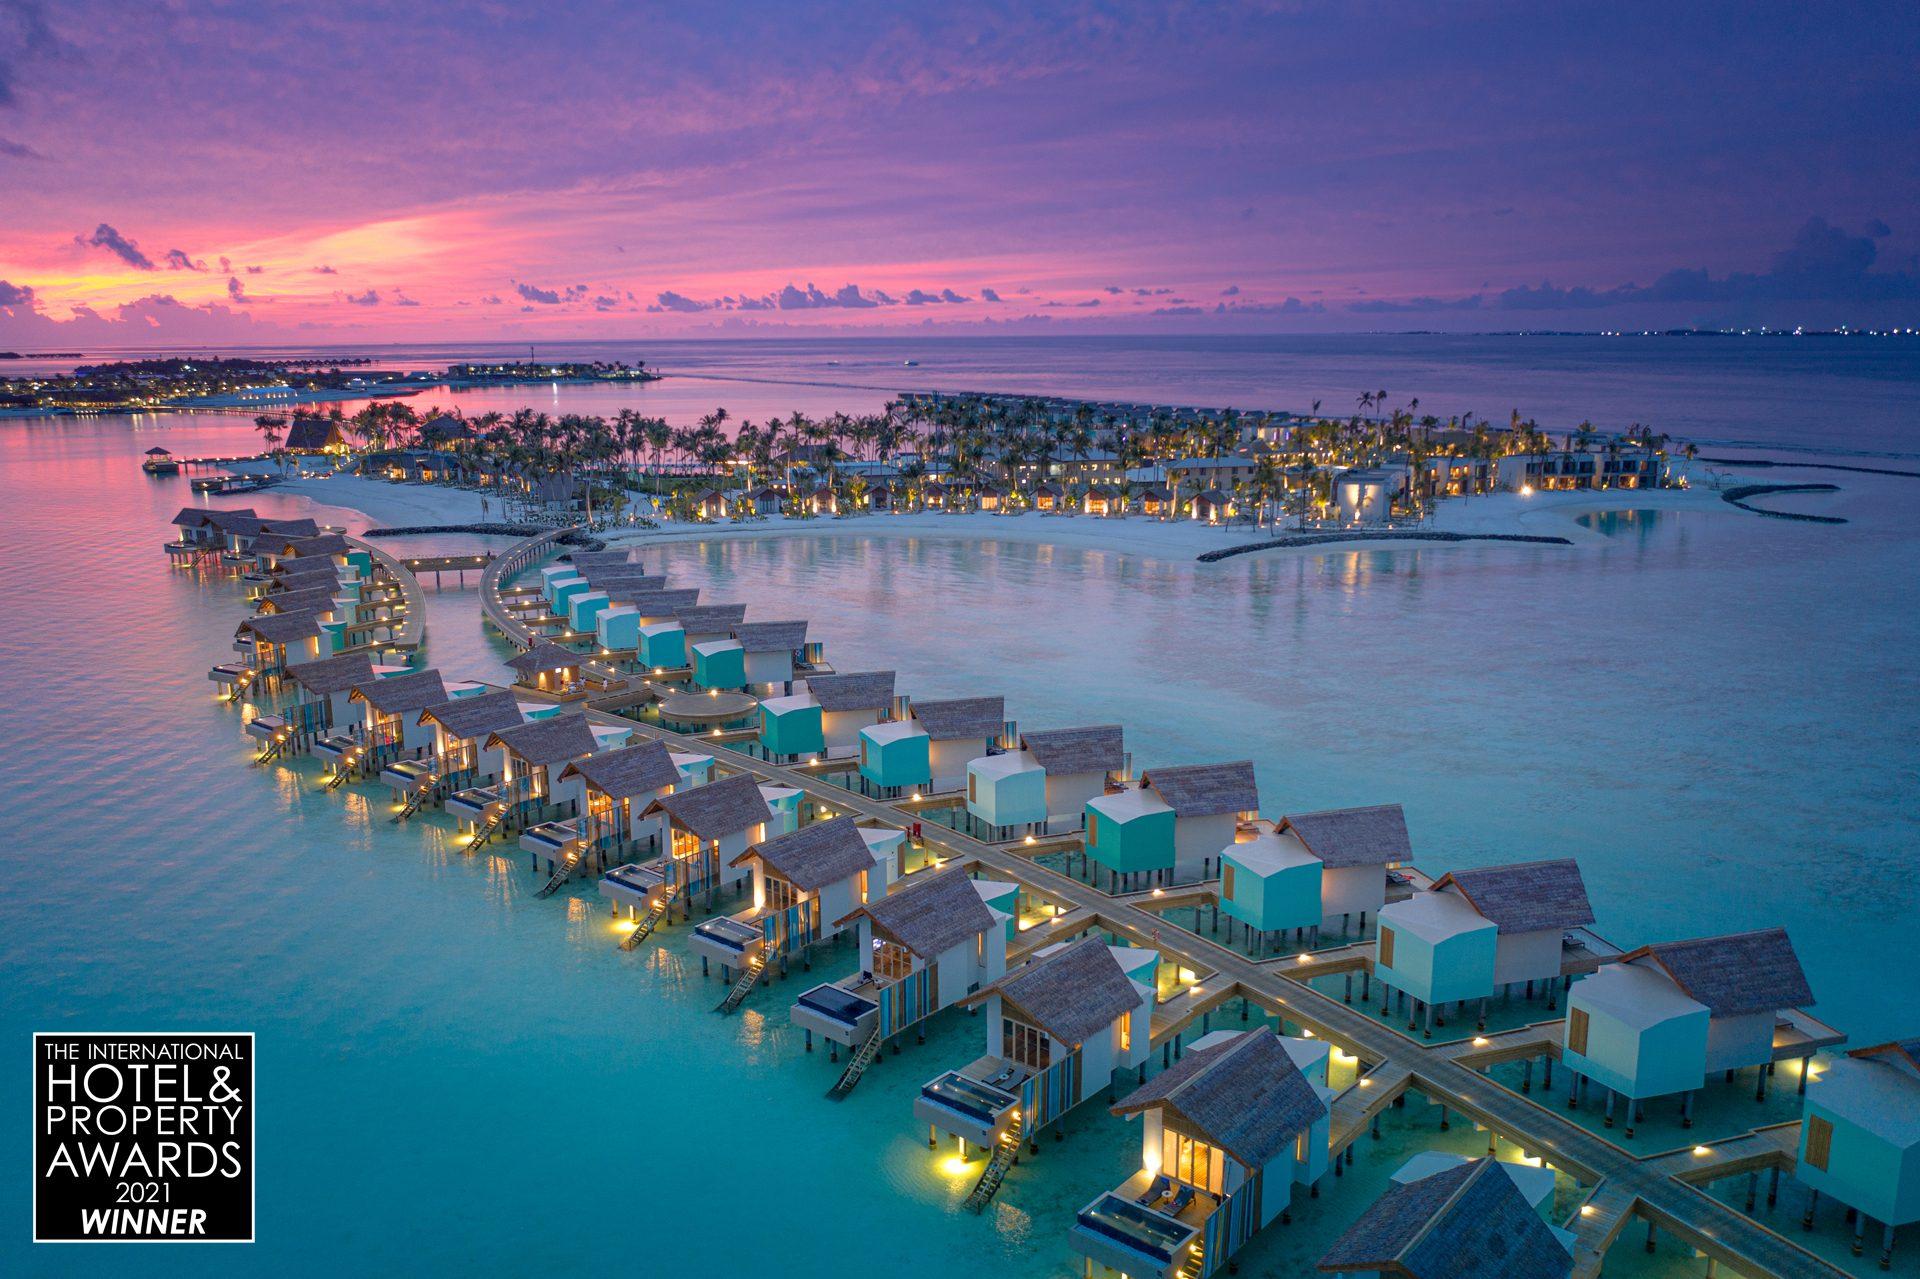 Hard Rock Hotel Maldives - Aerial shot